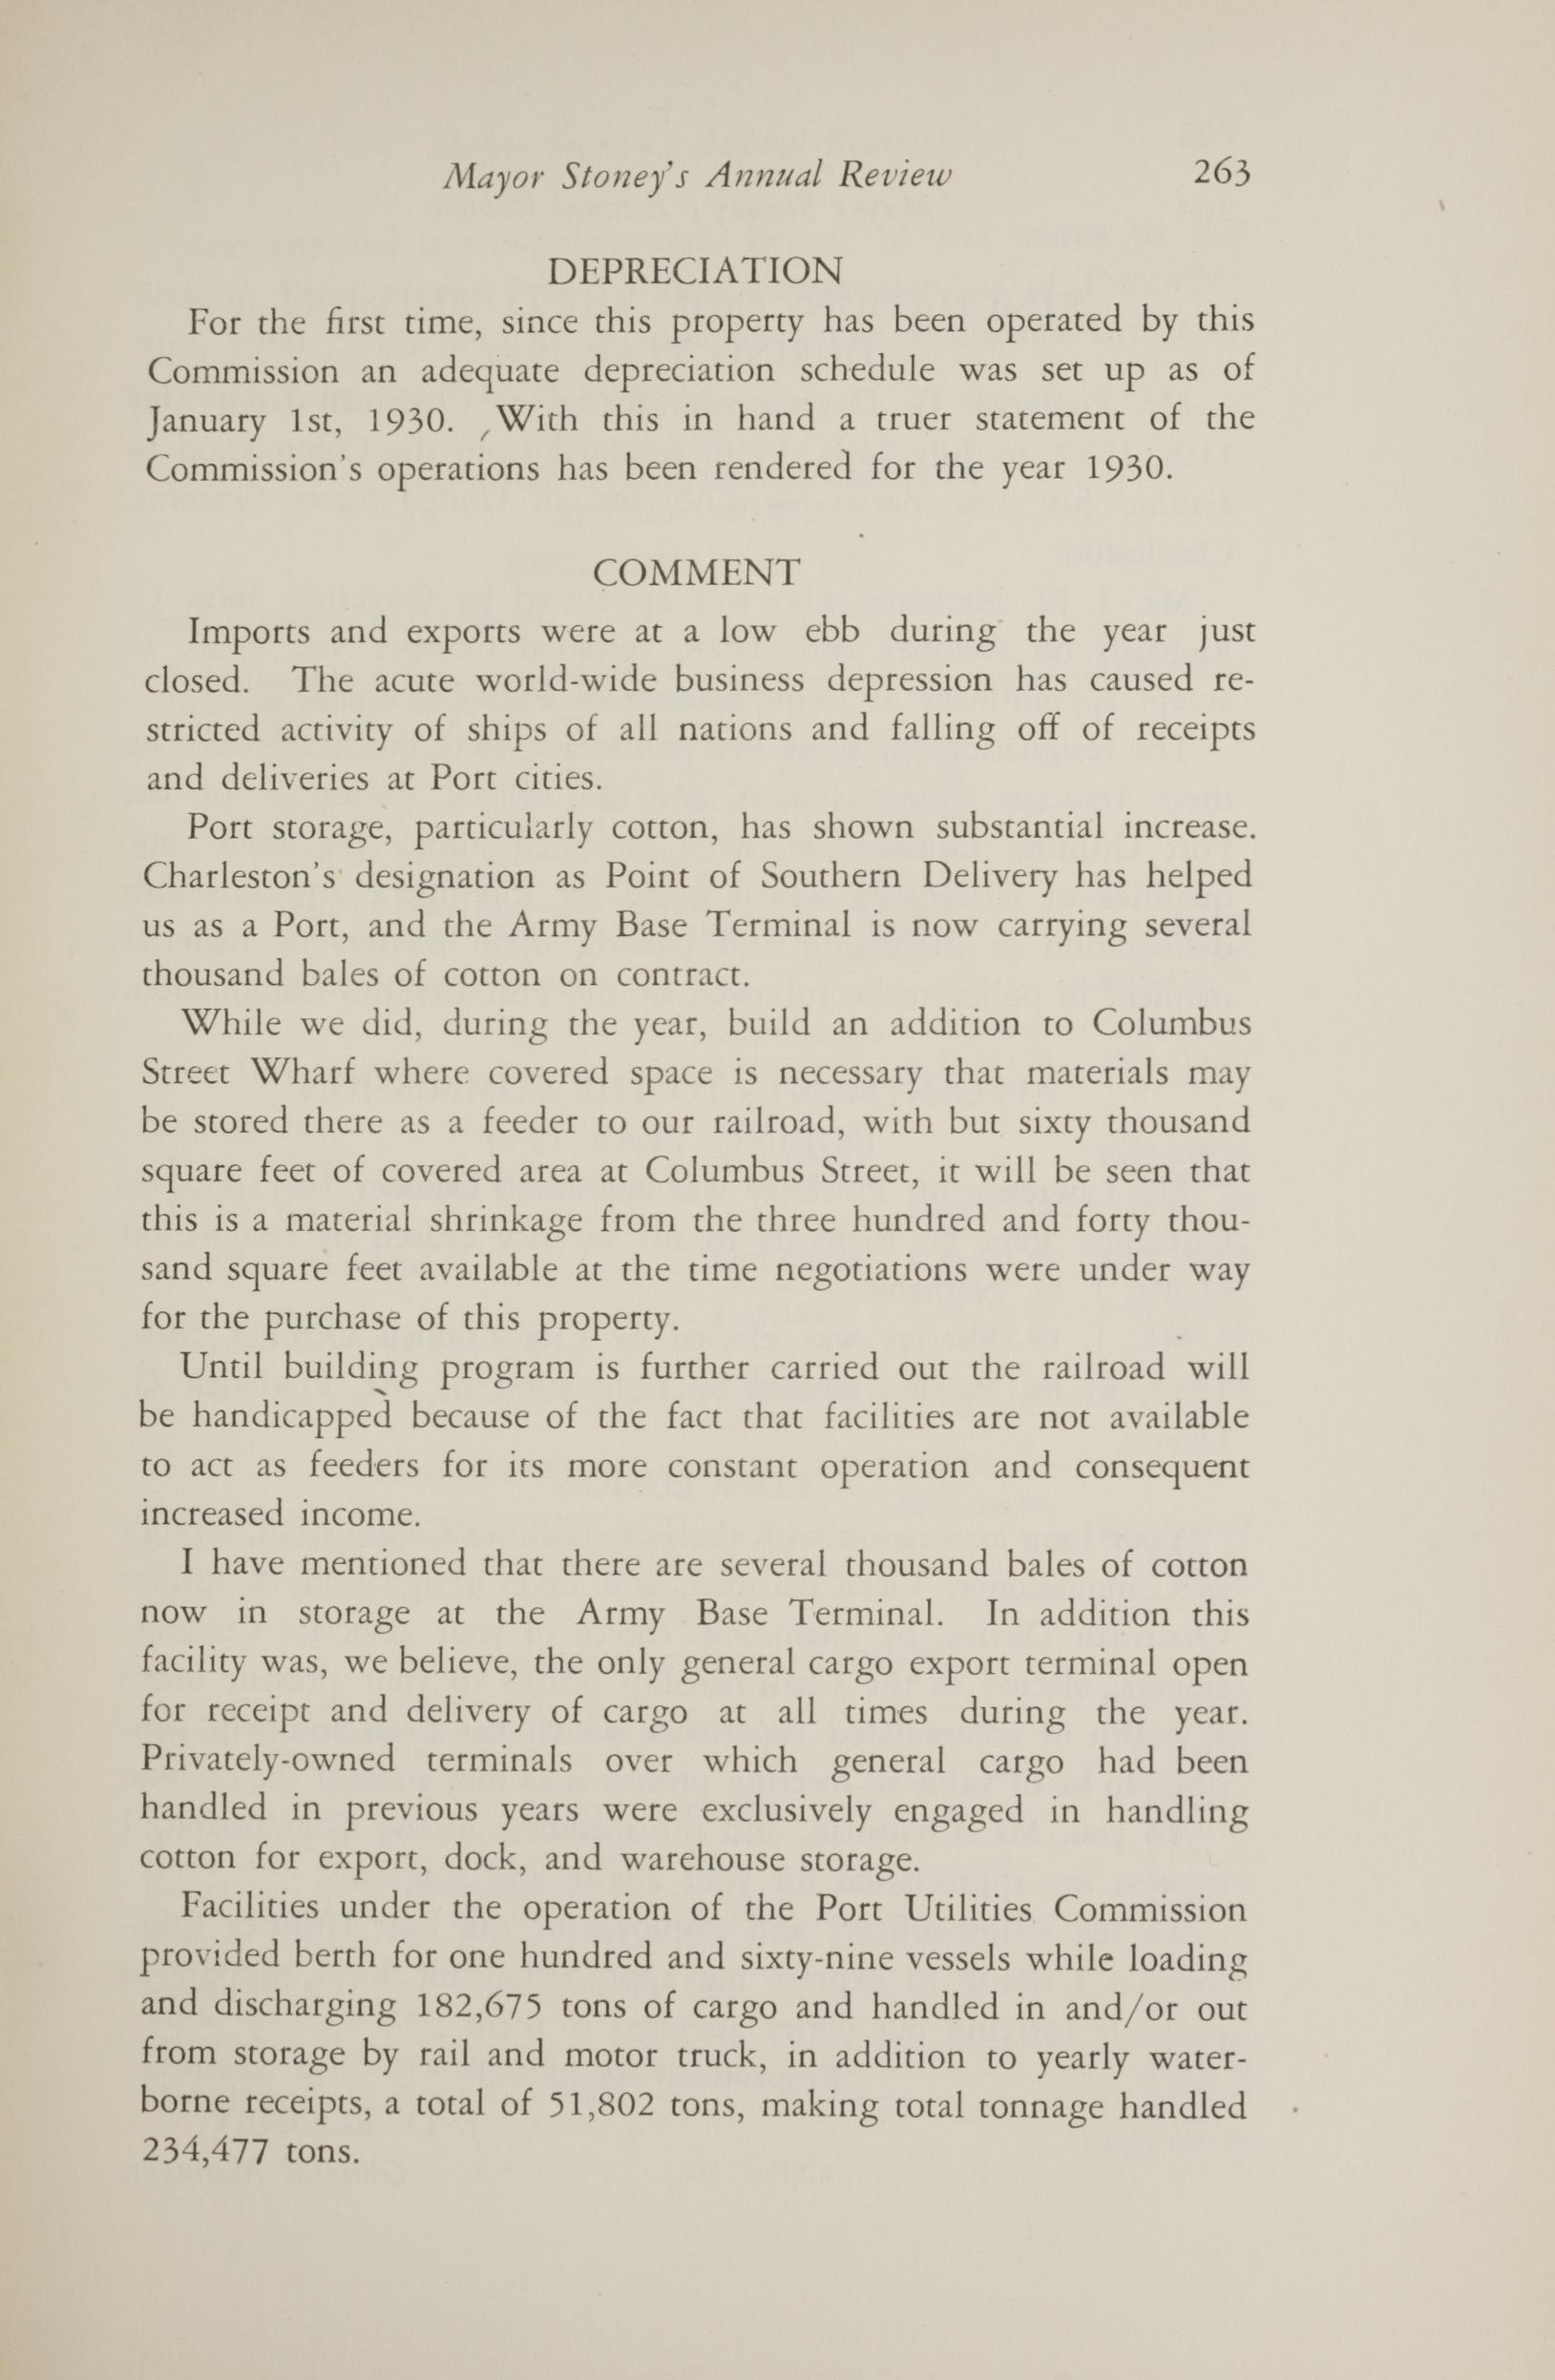 Charleston Yearbook, 1930, page 263